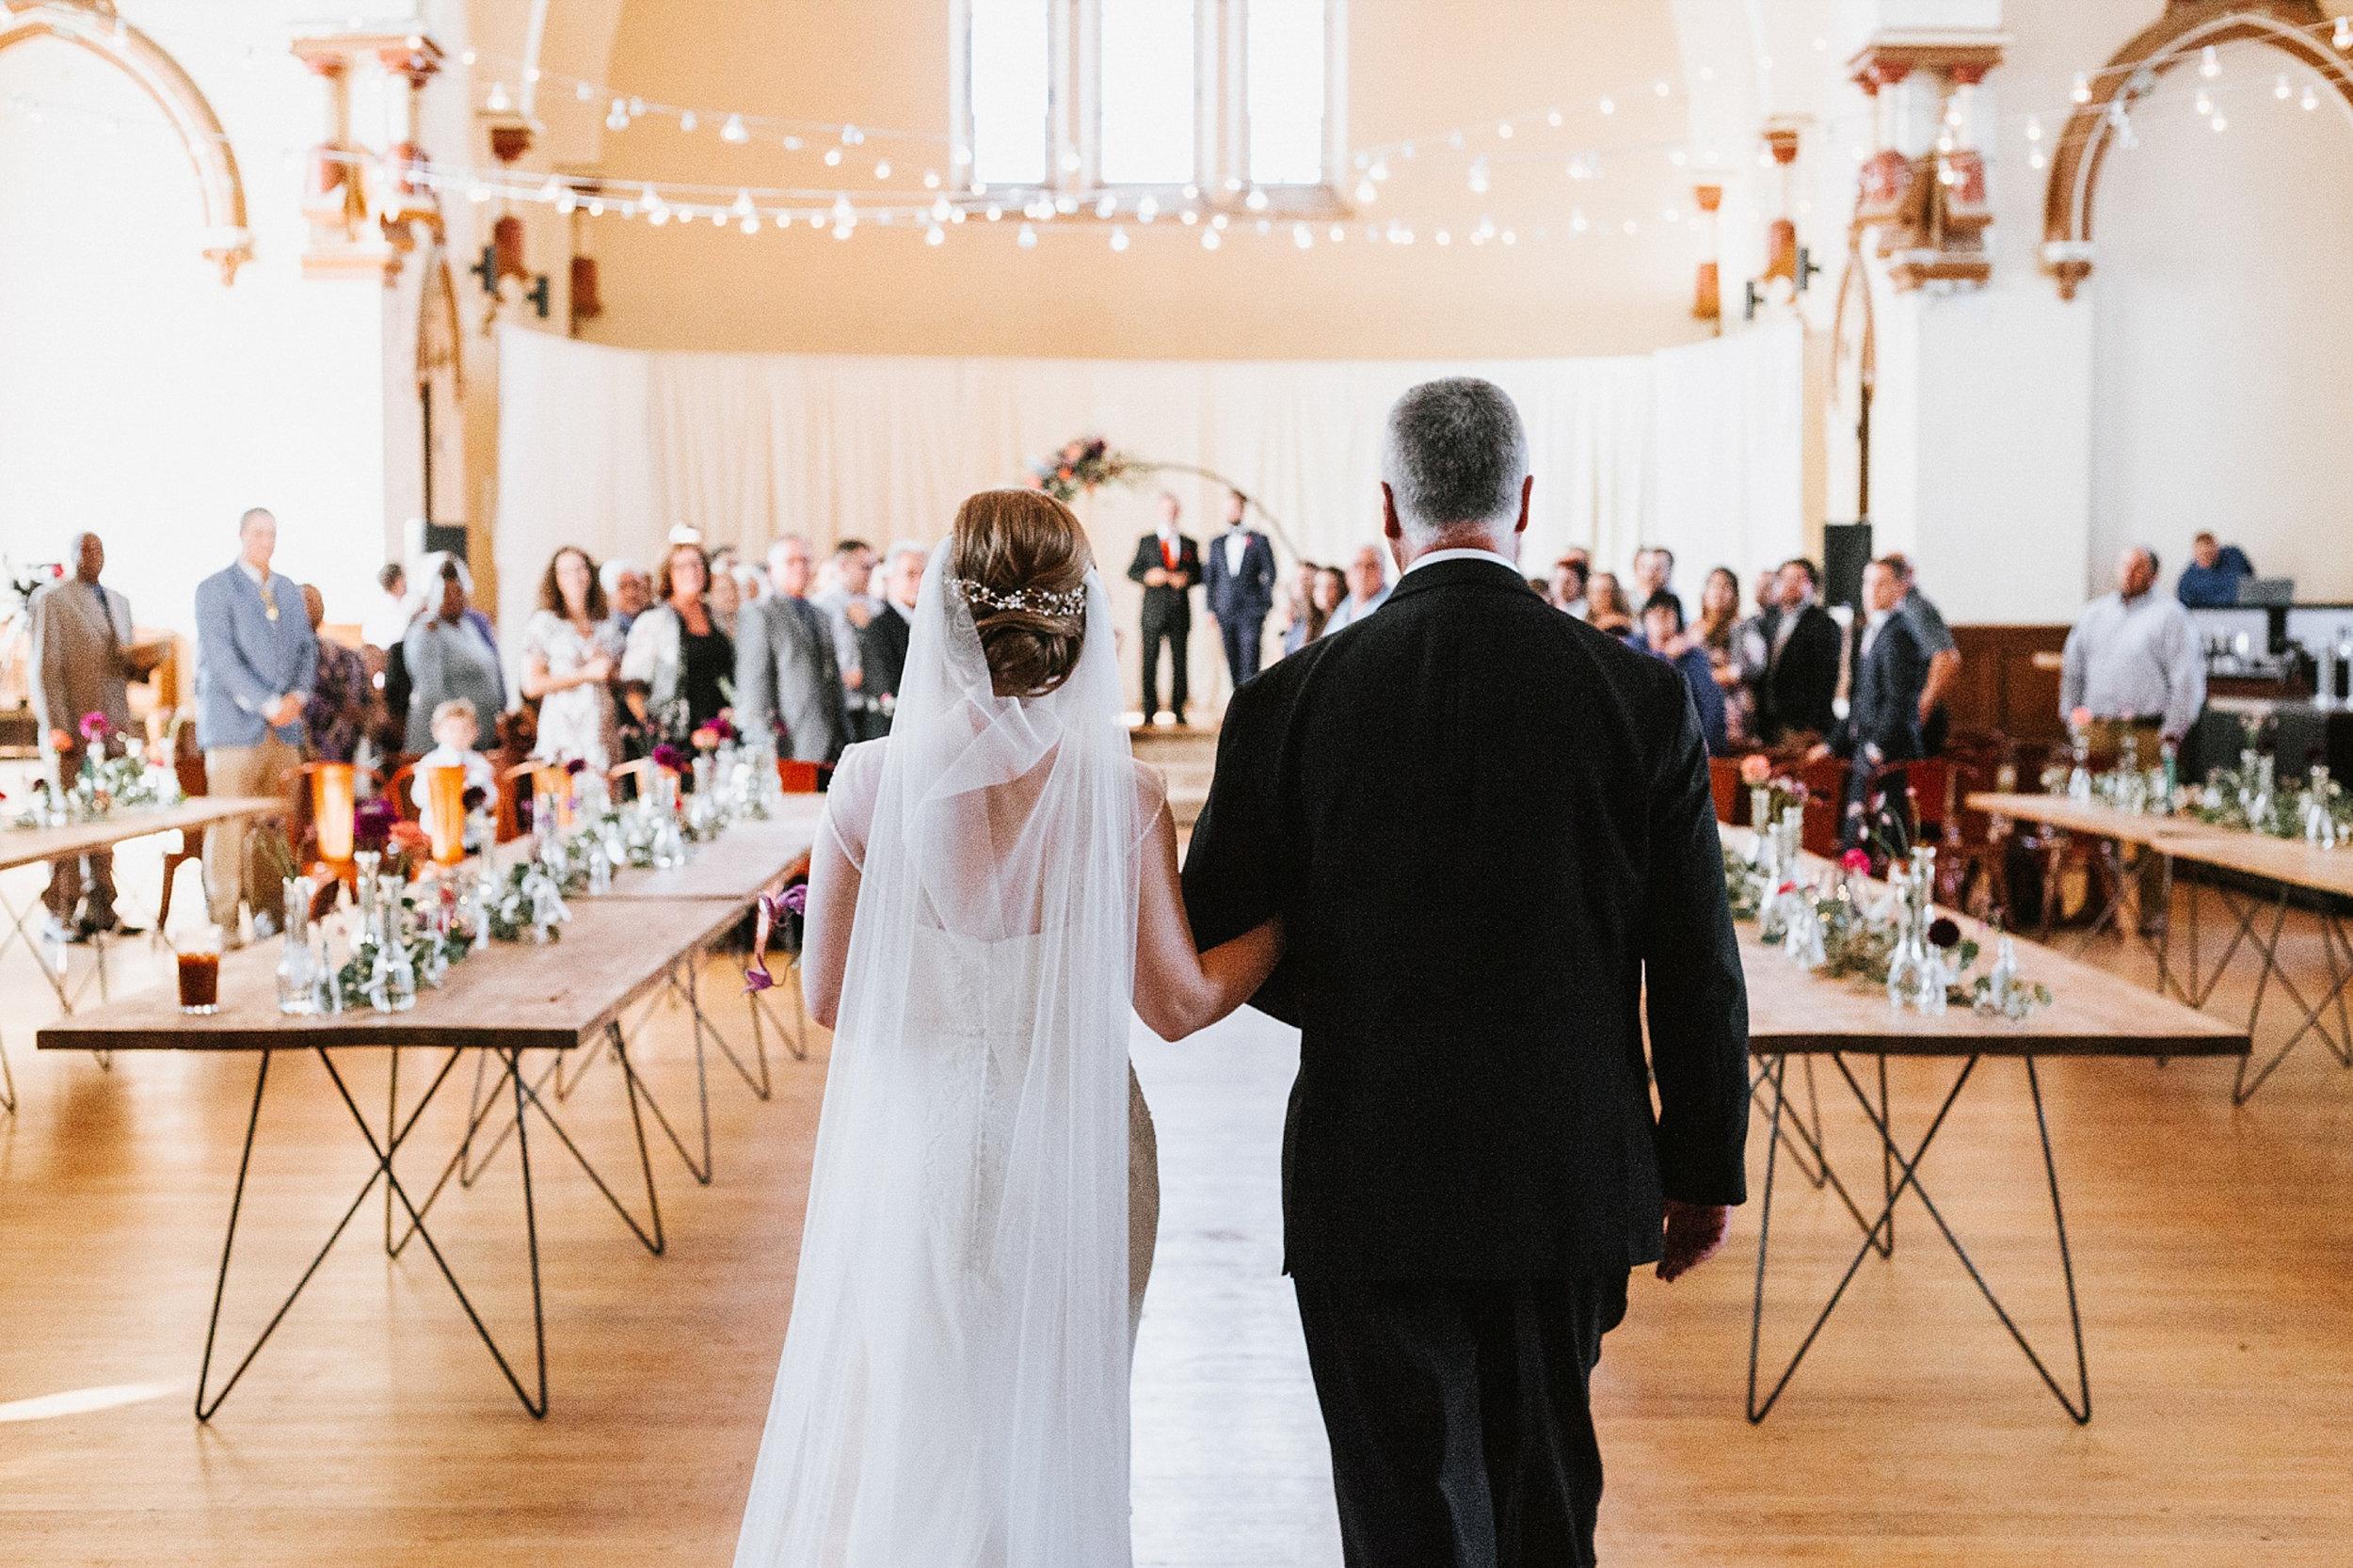 Brooke Townsend Photography - Ohio Wedding Photographer-117.jpg